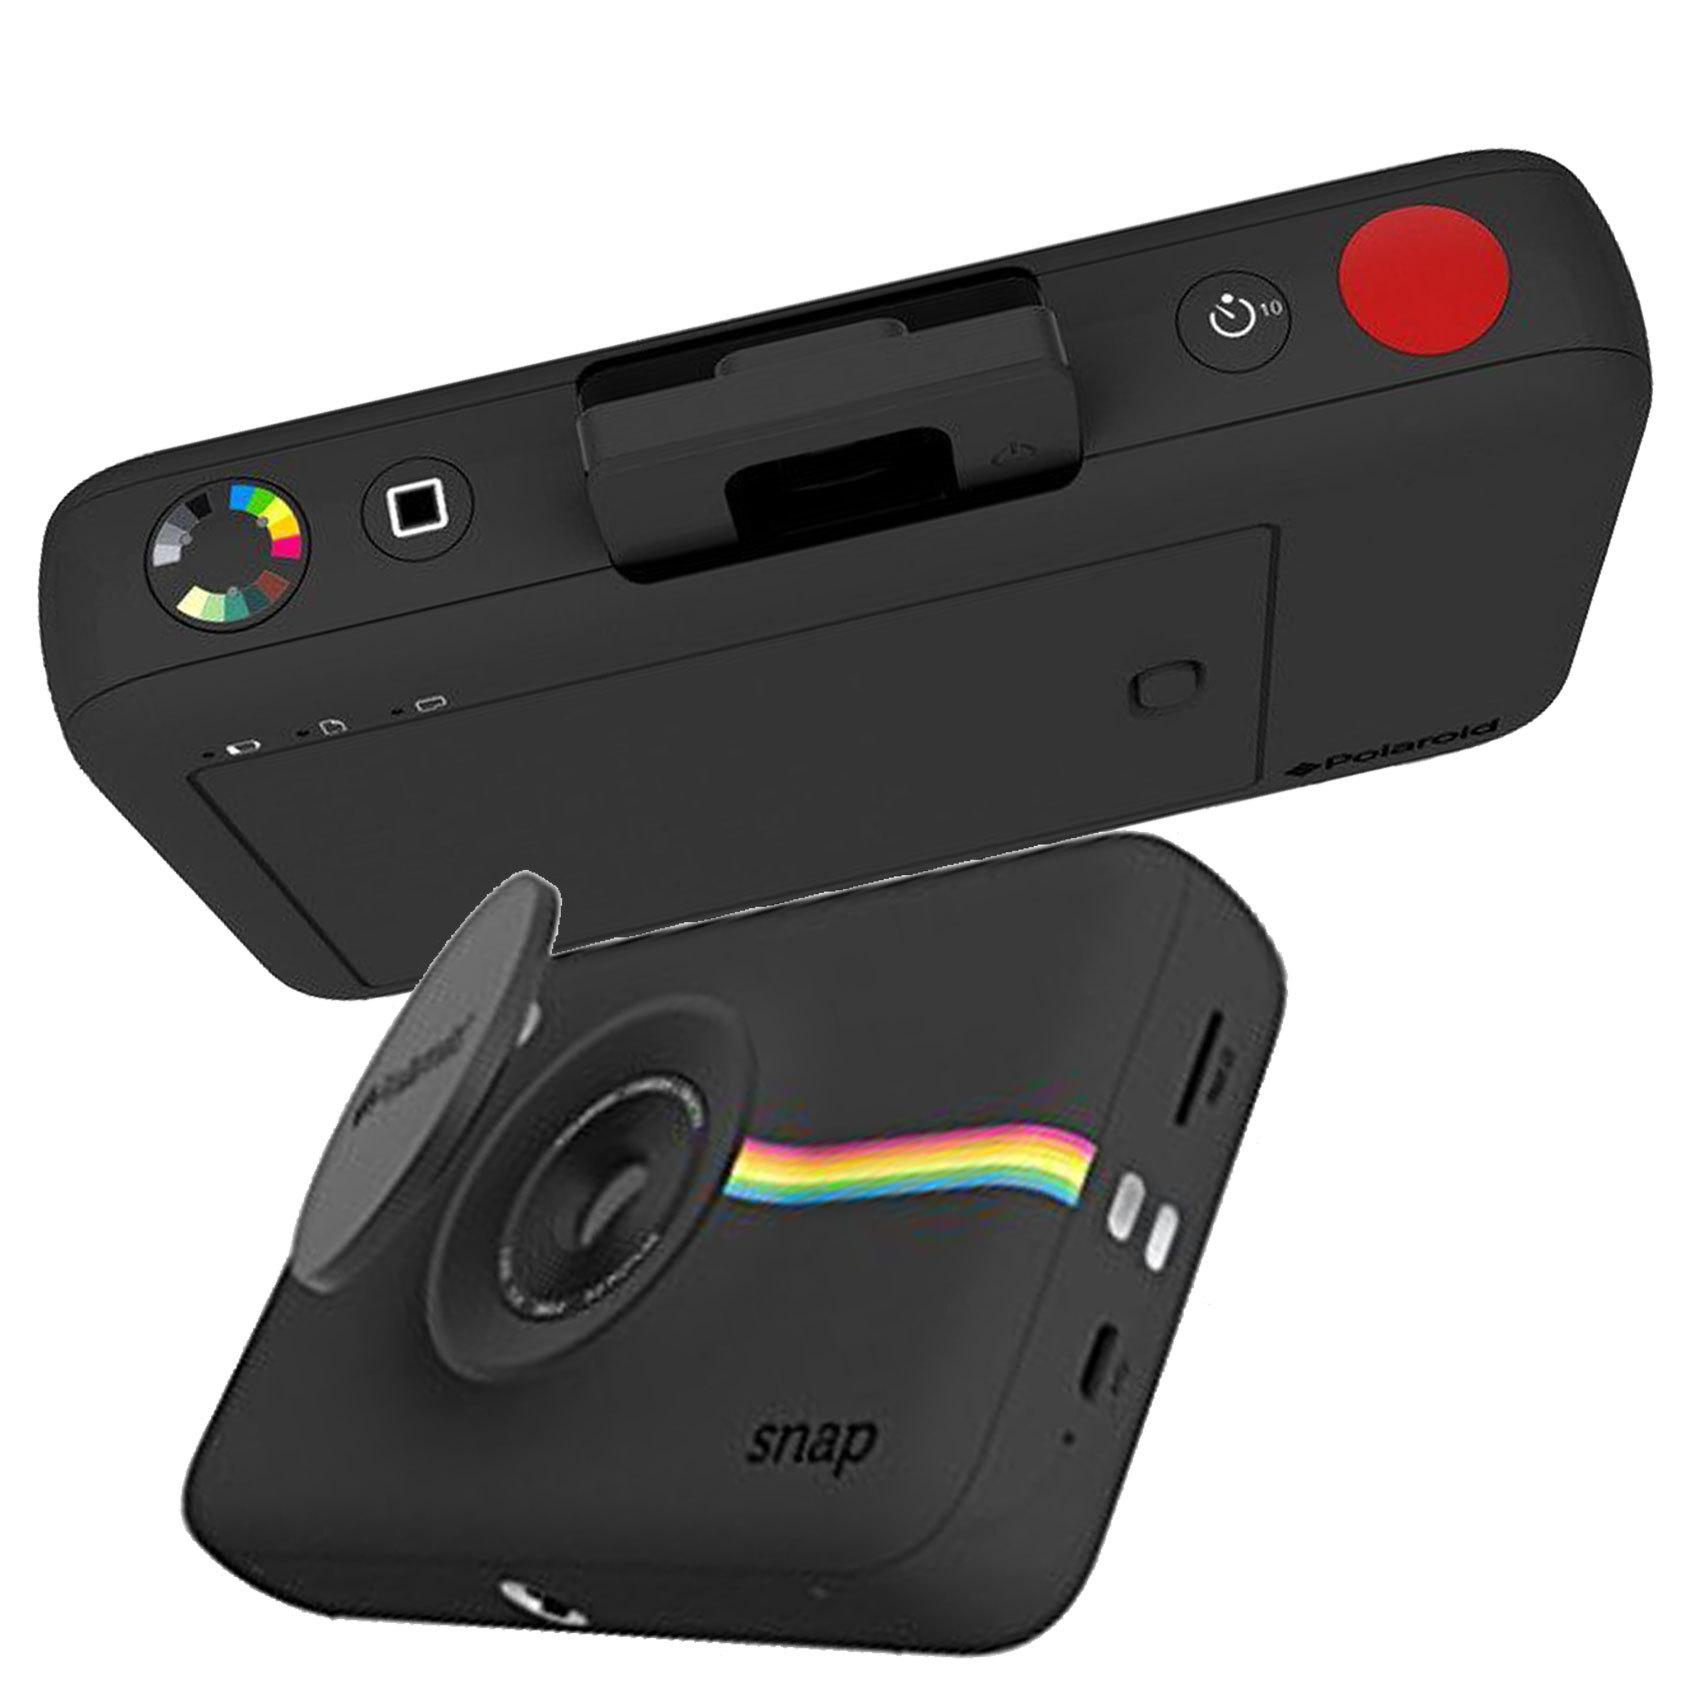 buy polaroid camera snap black online in uae carrefour uae